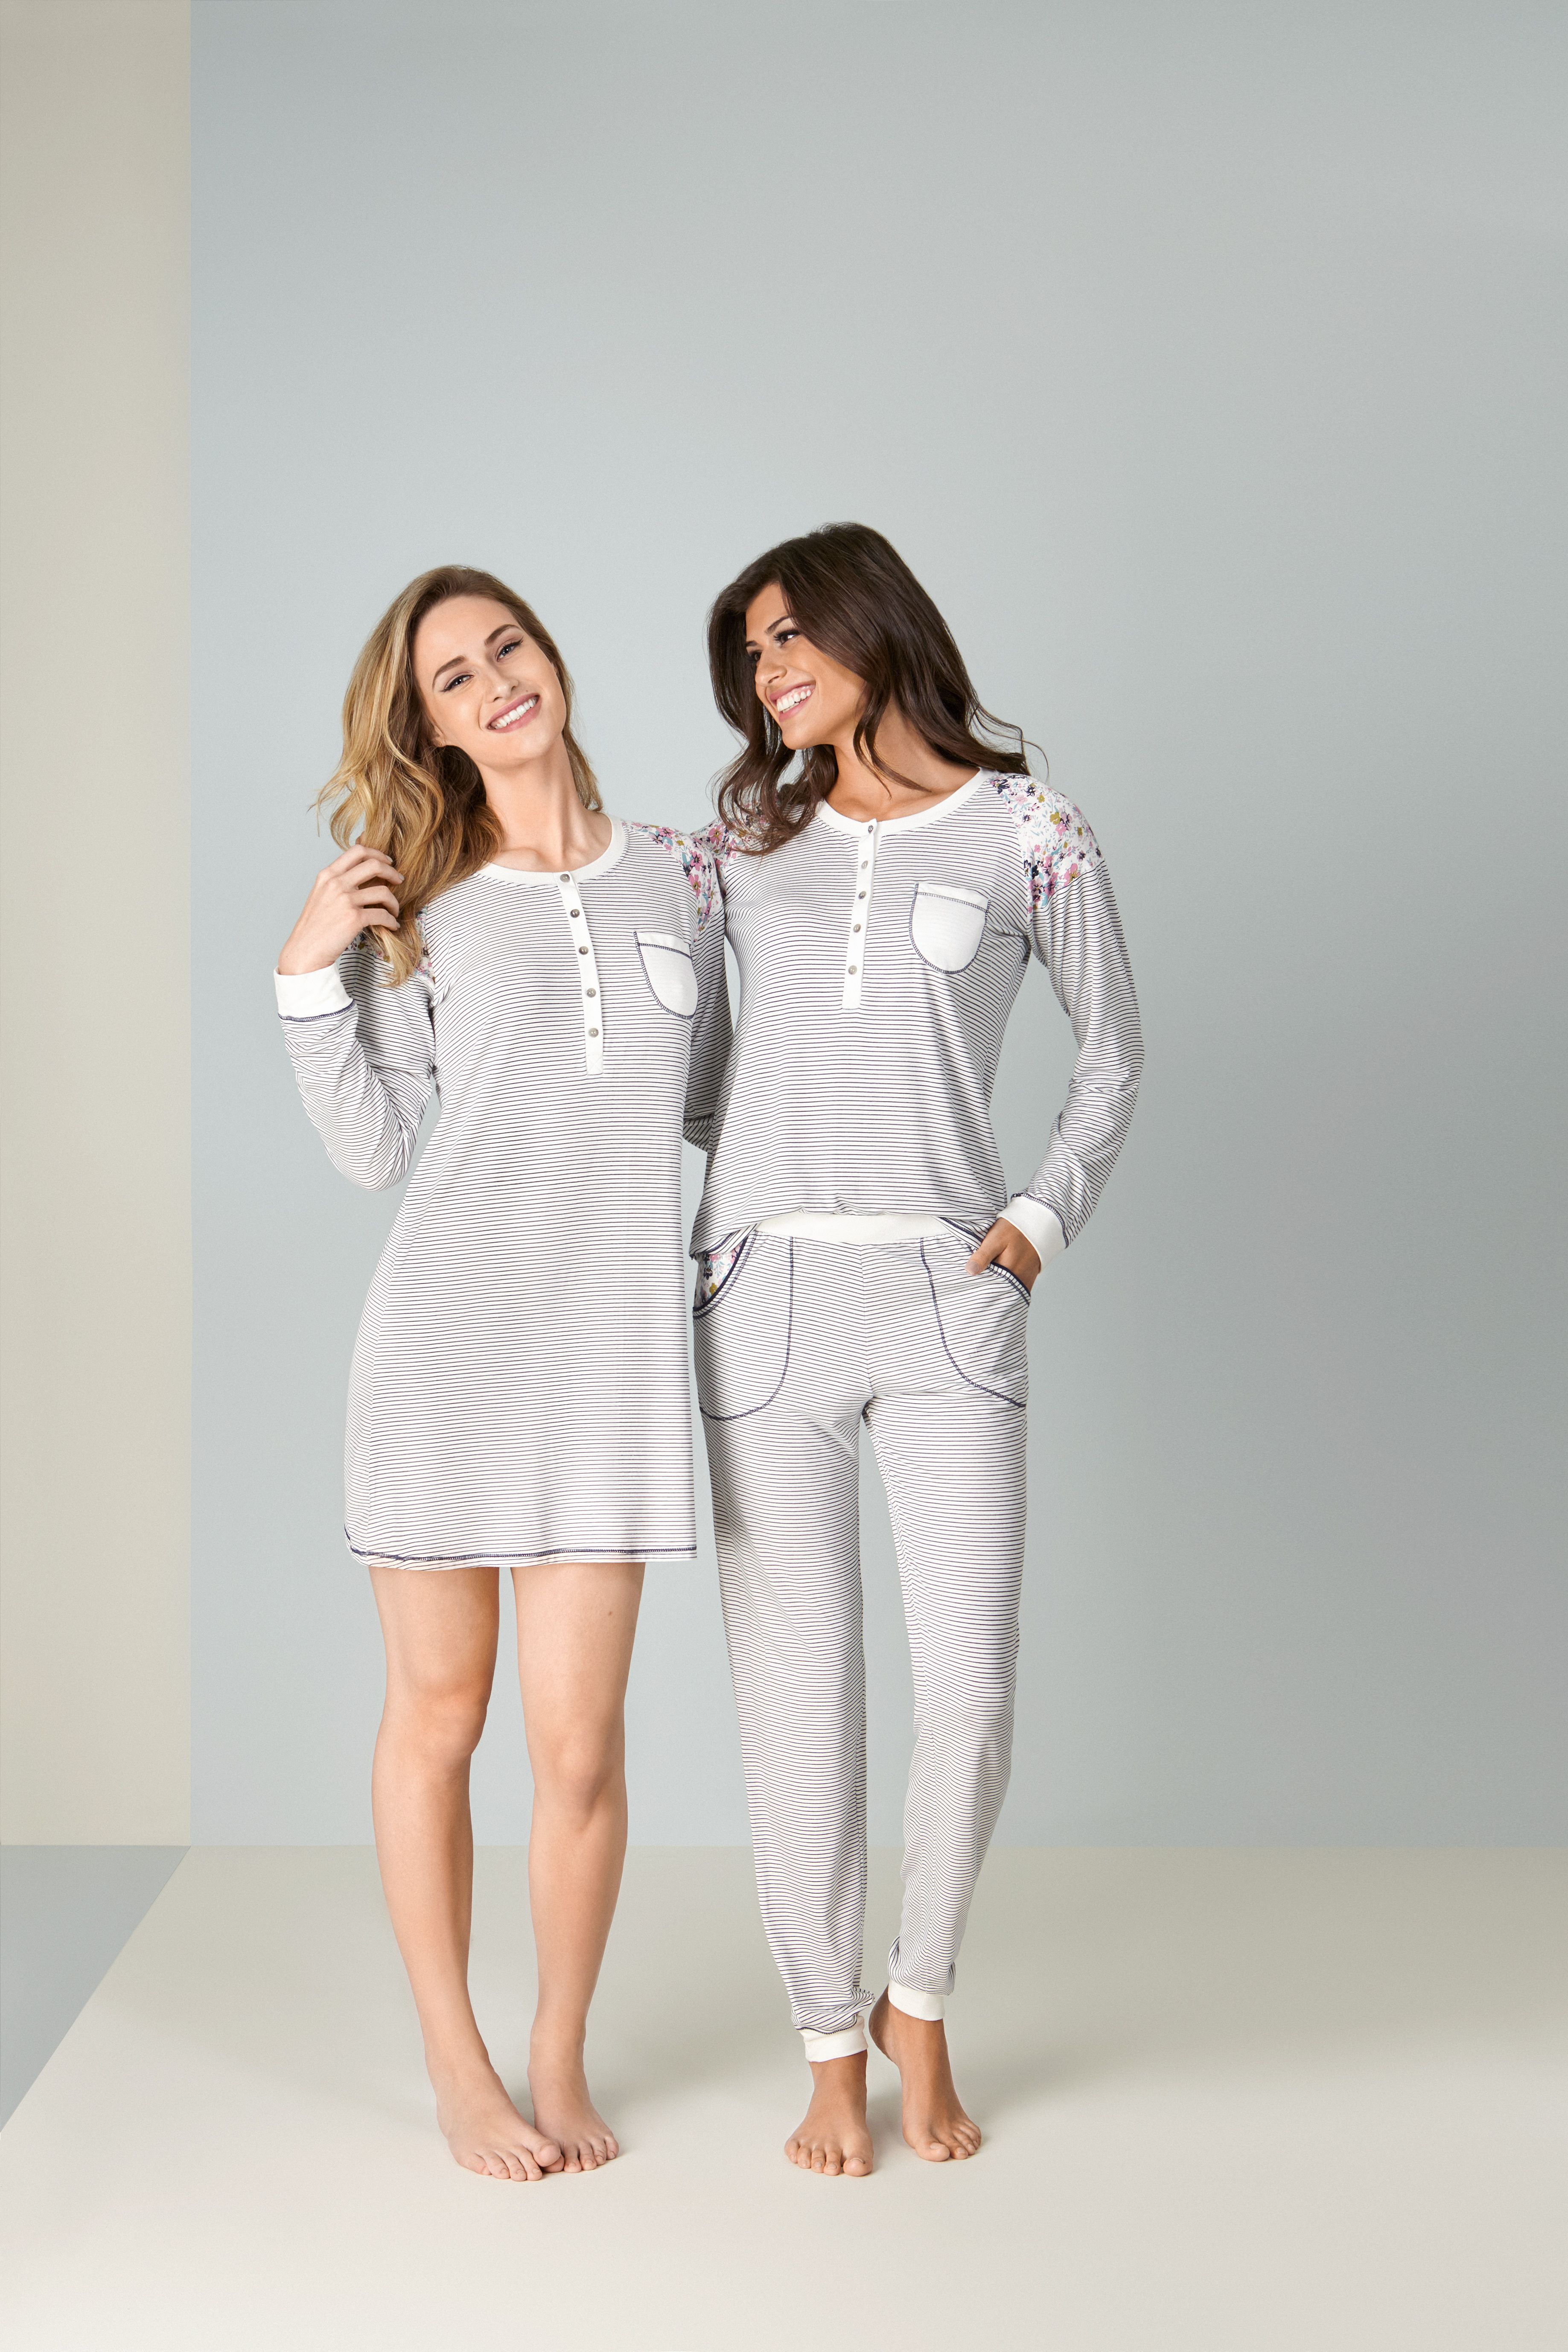 7c76326ab5314a Leveza para o Inverno! | Pjays/Sleep Wear em 2019 | Pijama inverno ...